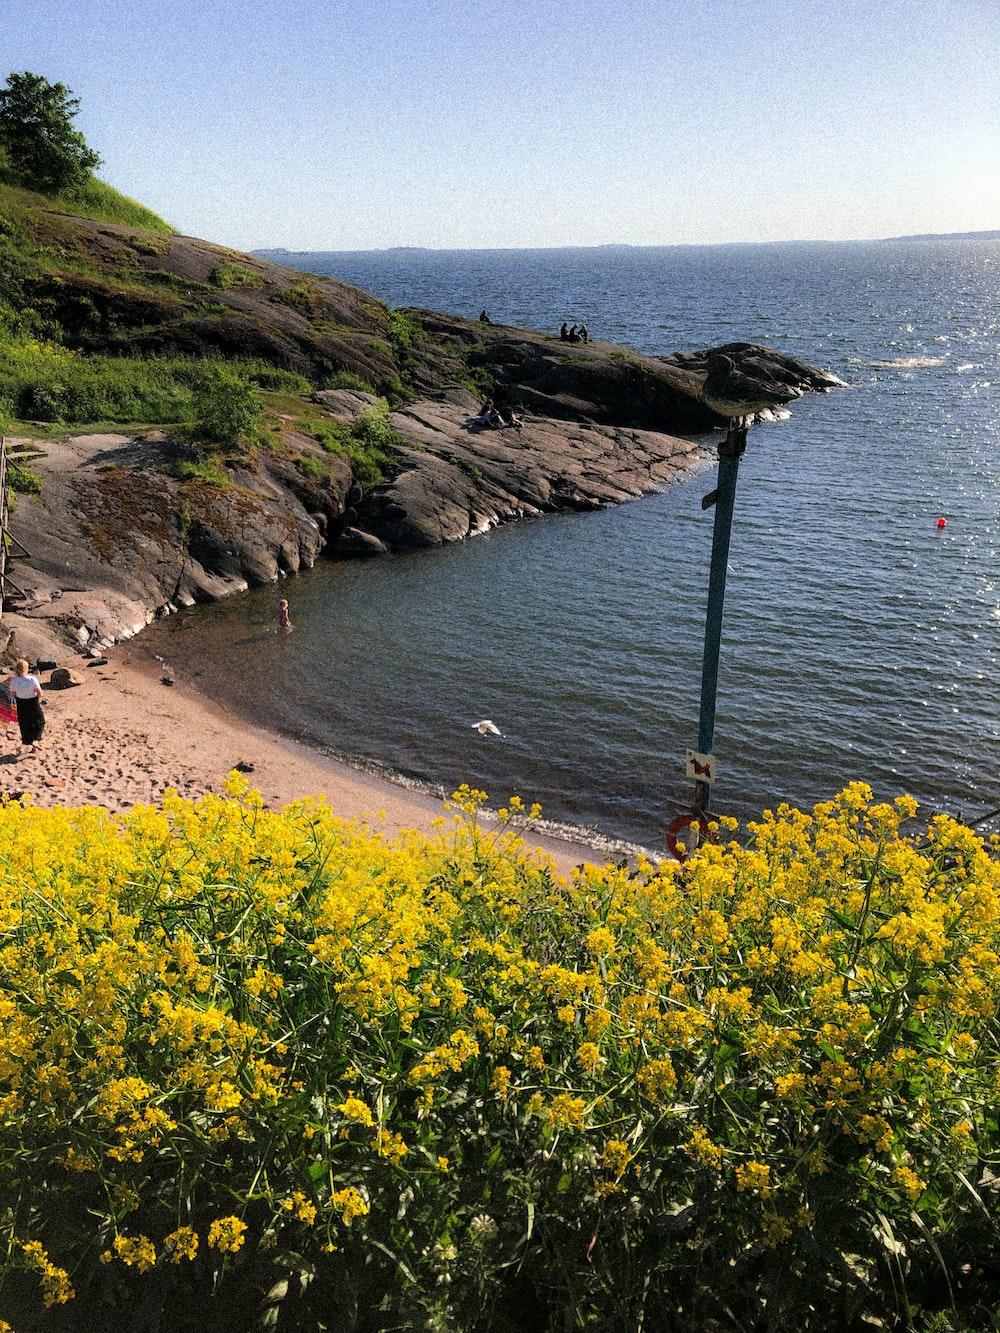 yellow flower field near beach during daytime